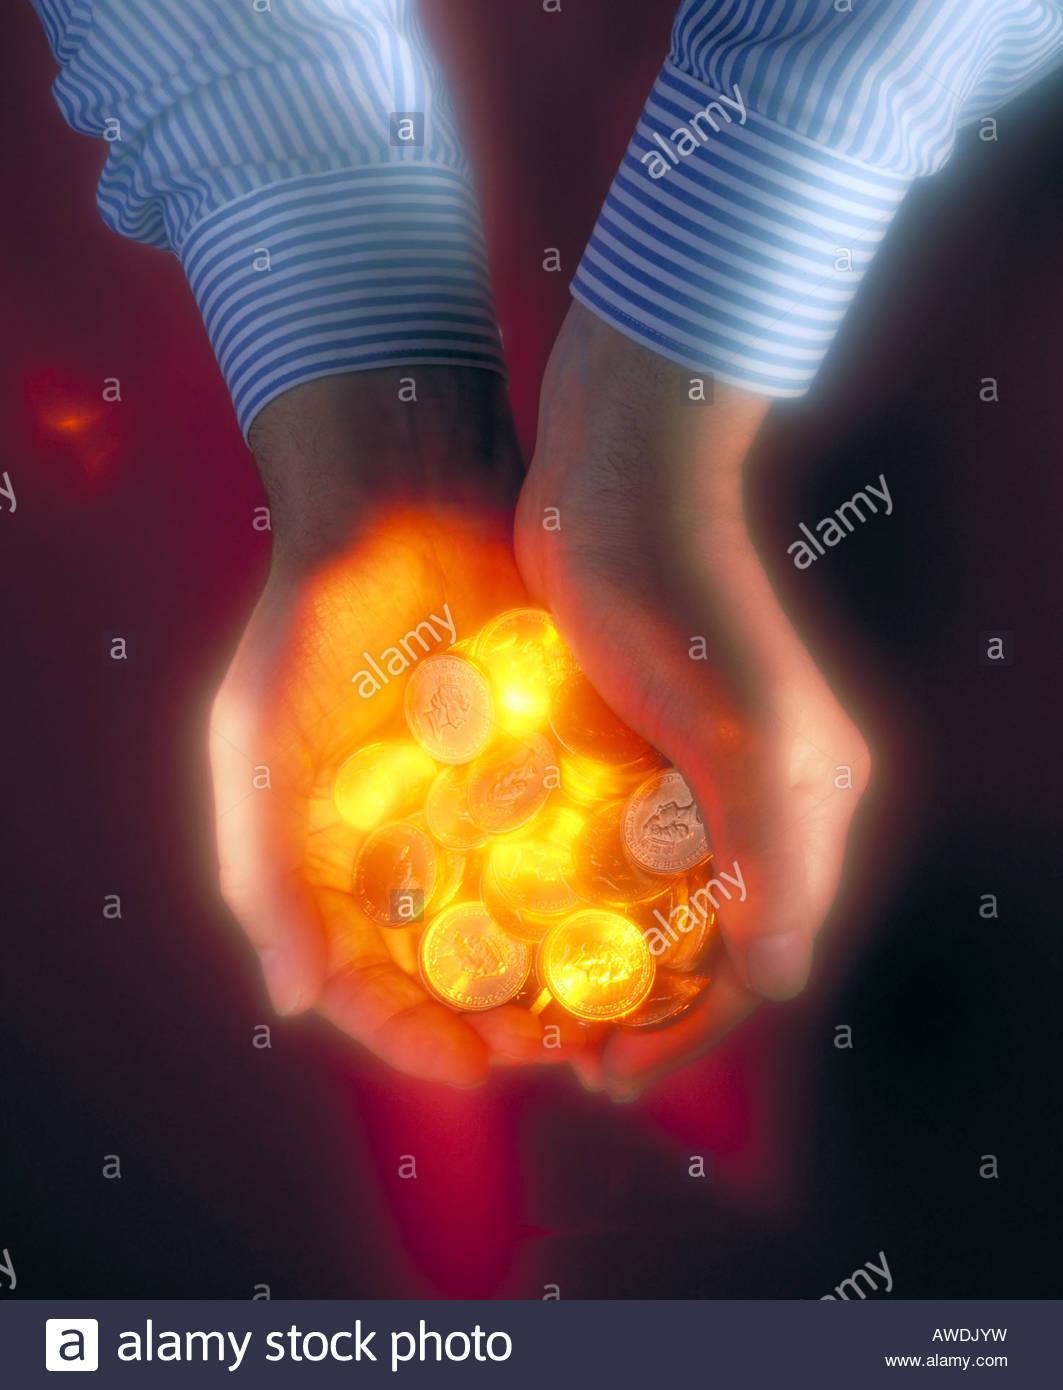 Hands holding hot golden money - Stock Image